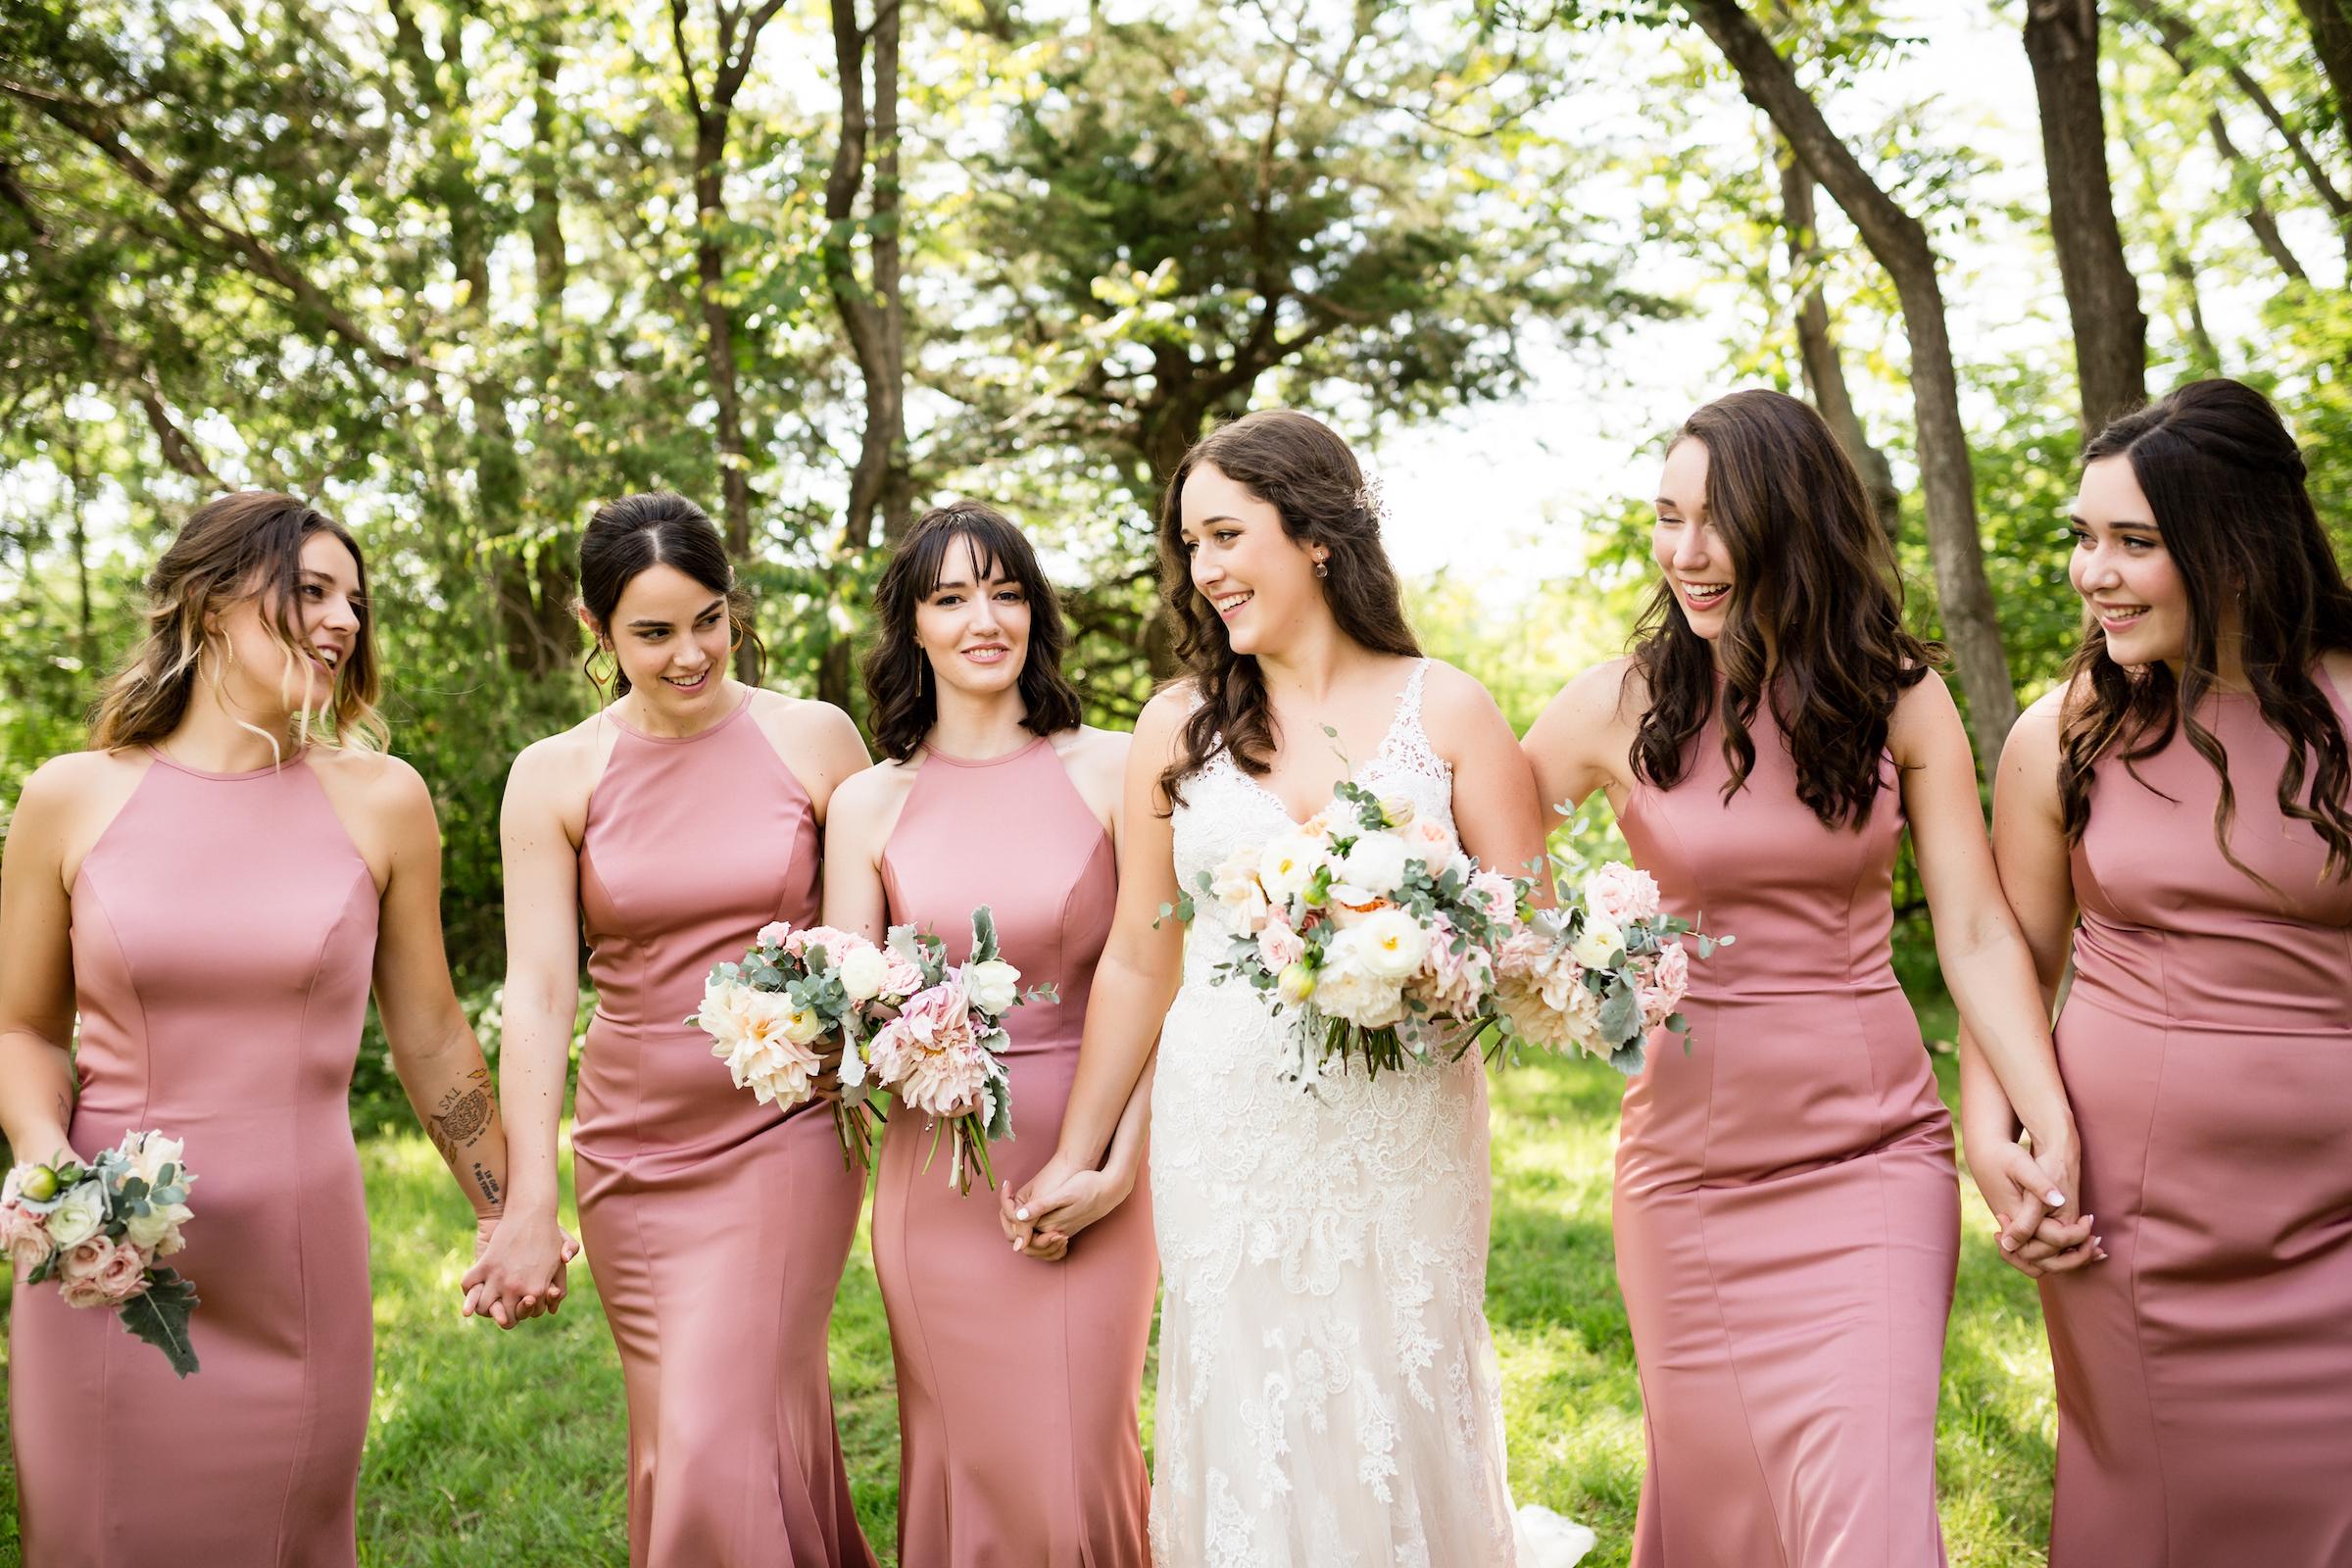 brielle-davis-events-kairos-photography-chandler-hill-wedding-bridesmaids.jpg